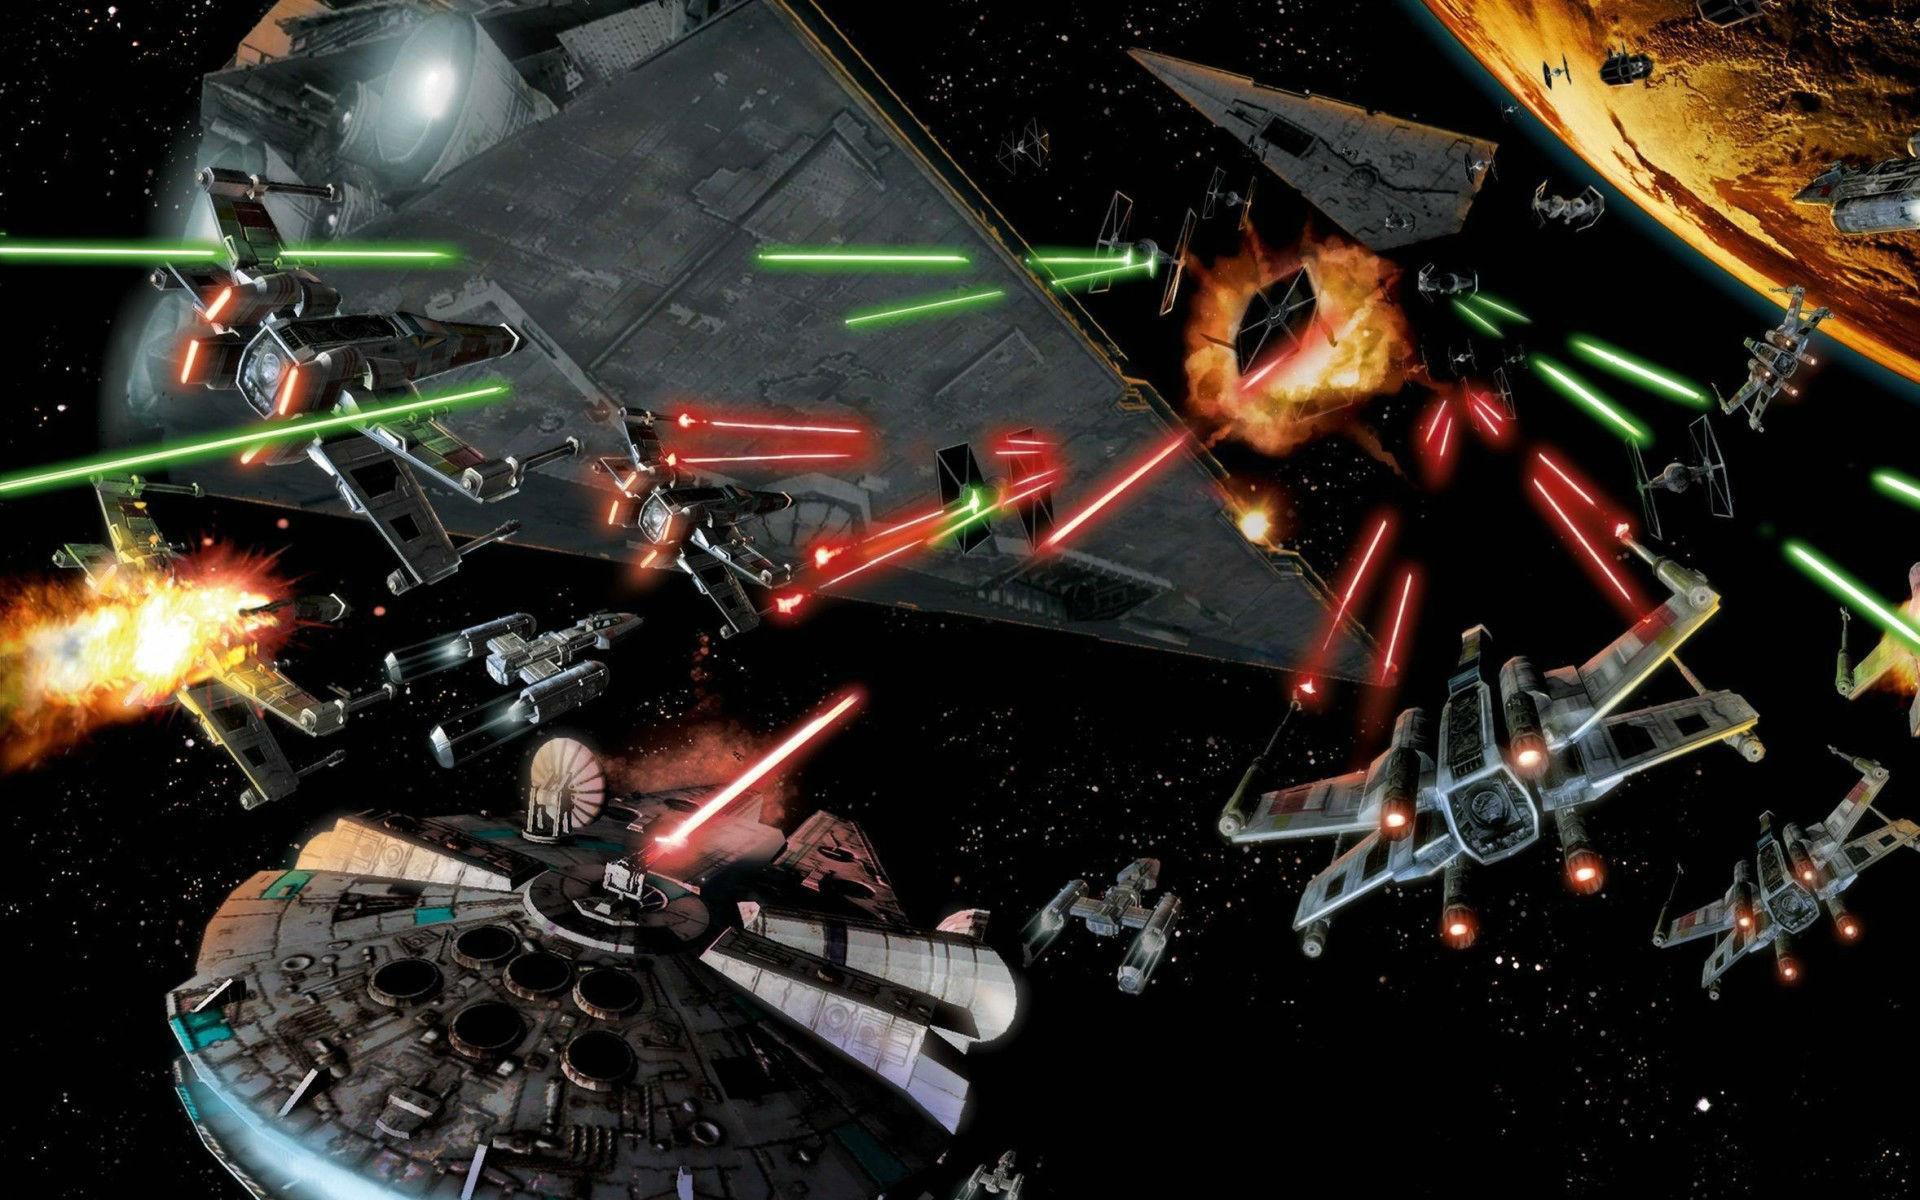 105 best Sci-Fi: Battles images on Pinterest | Star wars art, Concept art  and Star wars ships